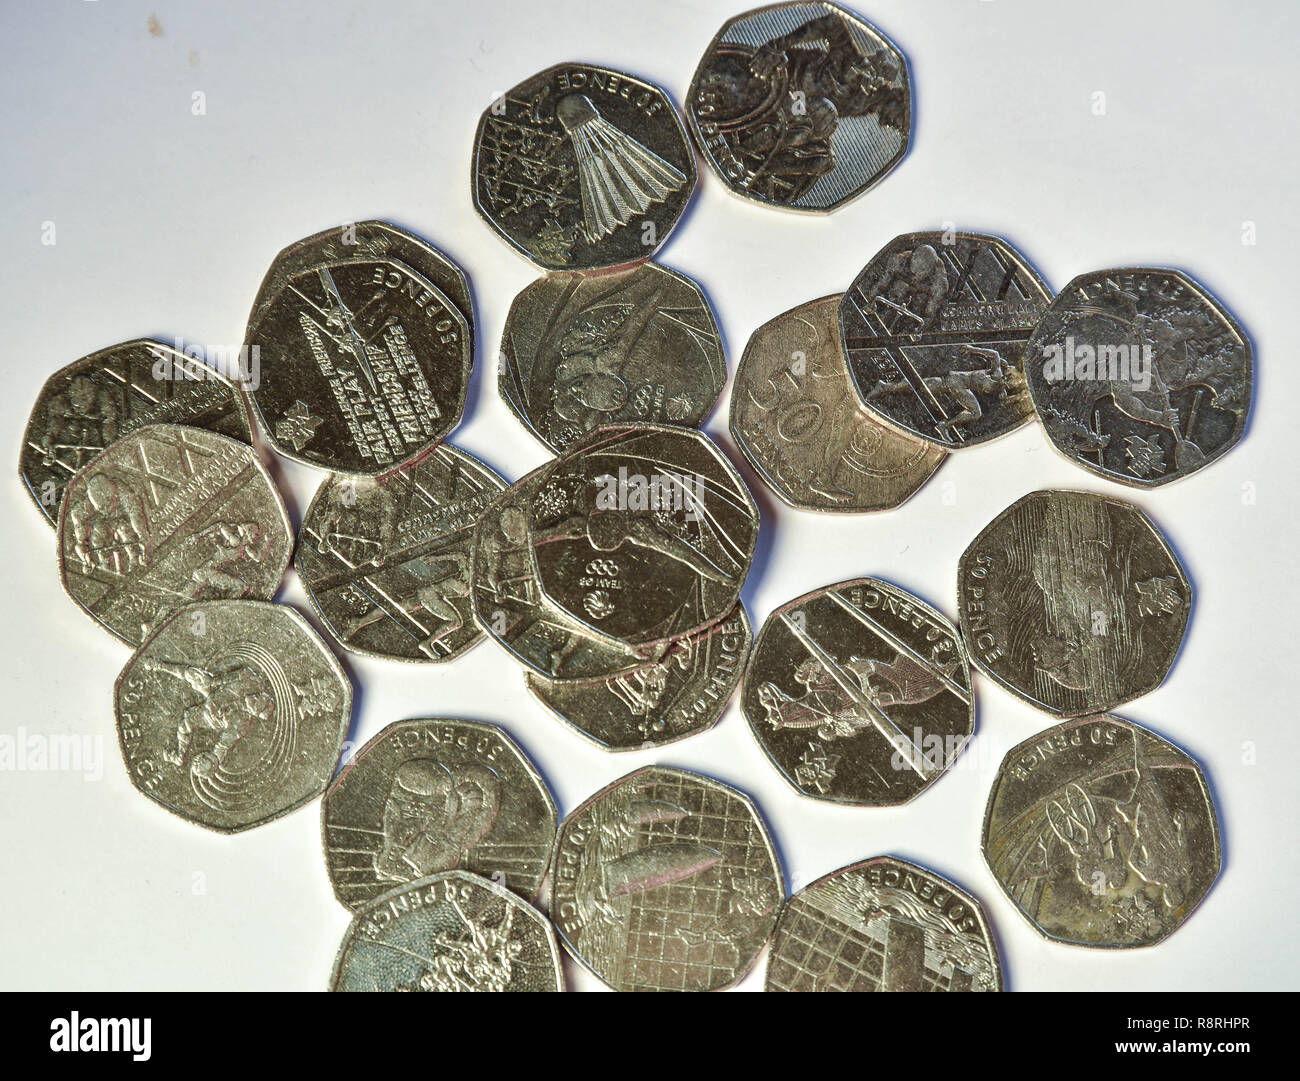 uk 50p coins celebrating the olympics - Stock Image